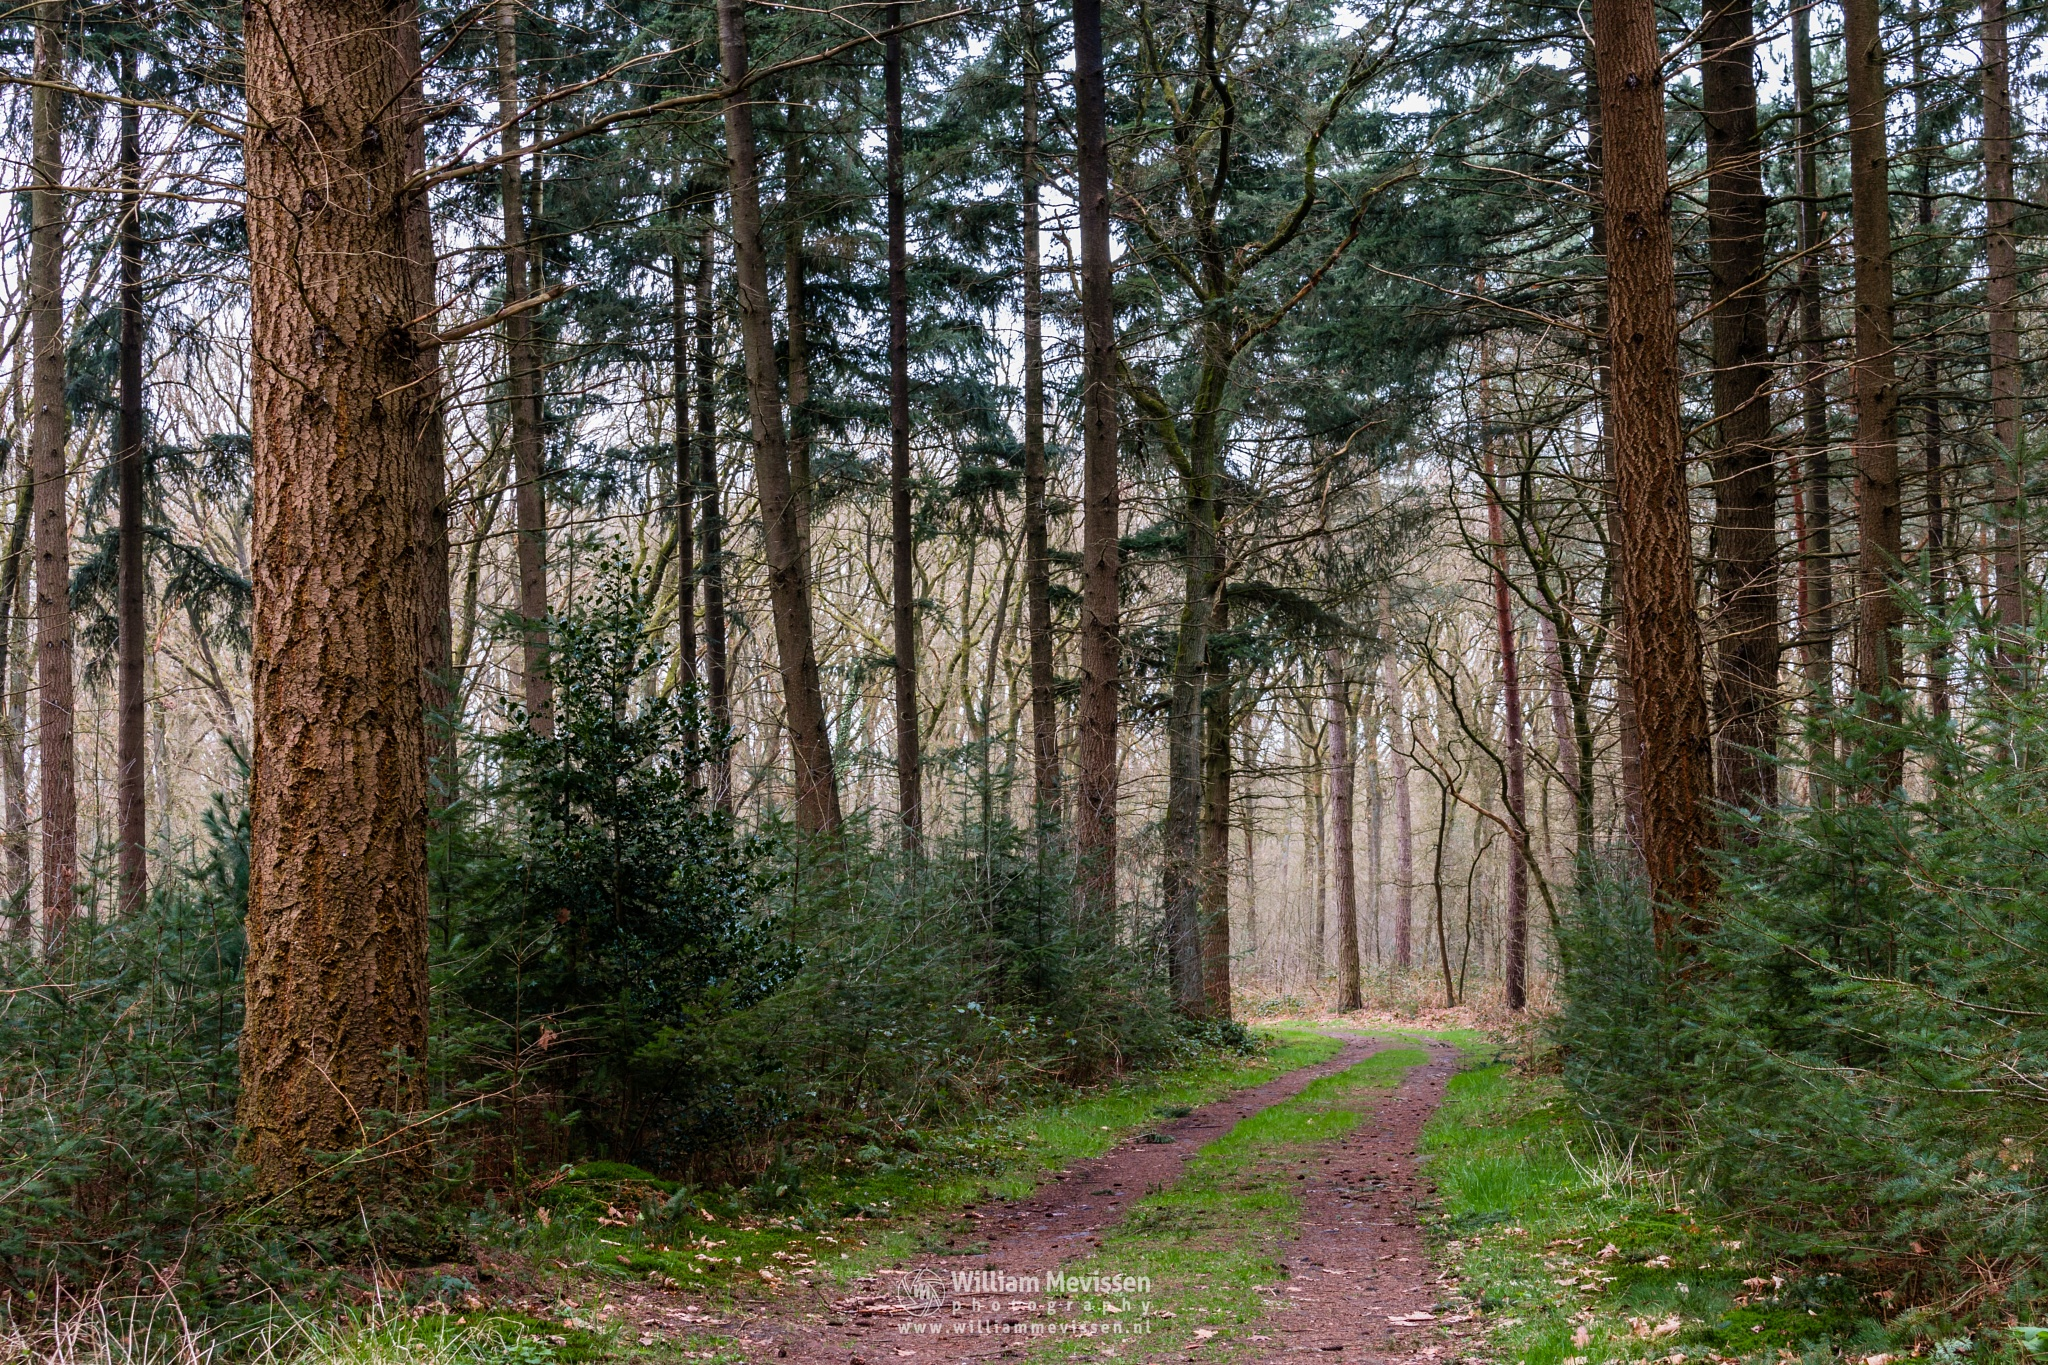 Path Of Trees by William Mevissen